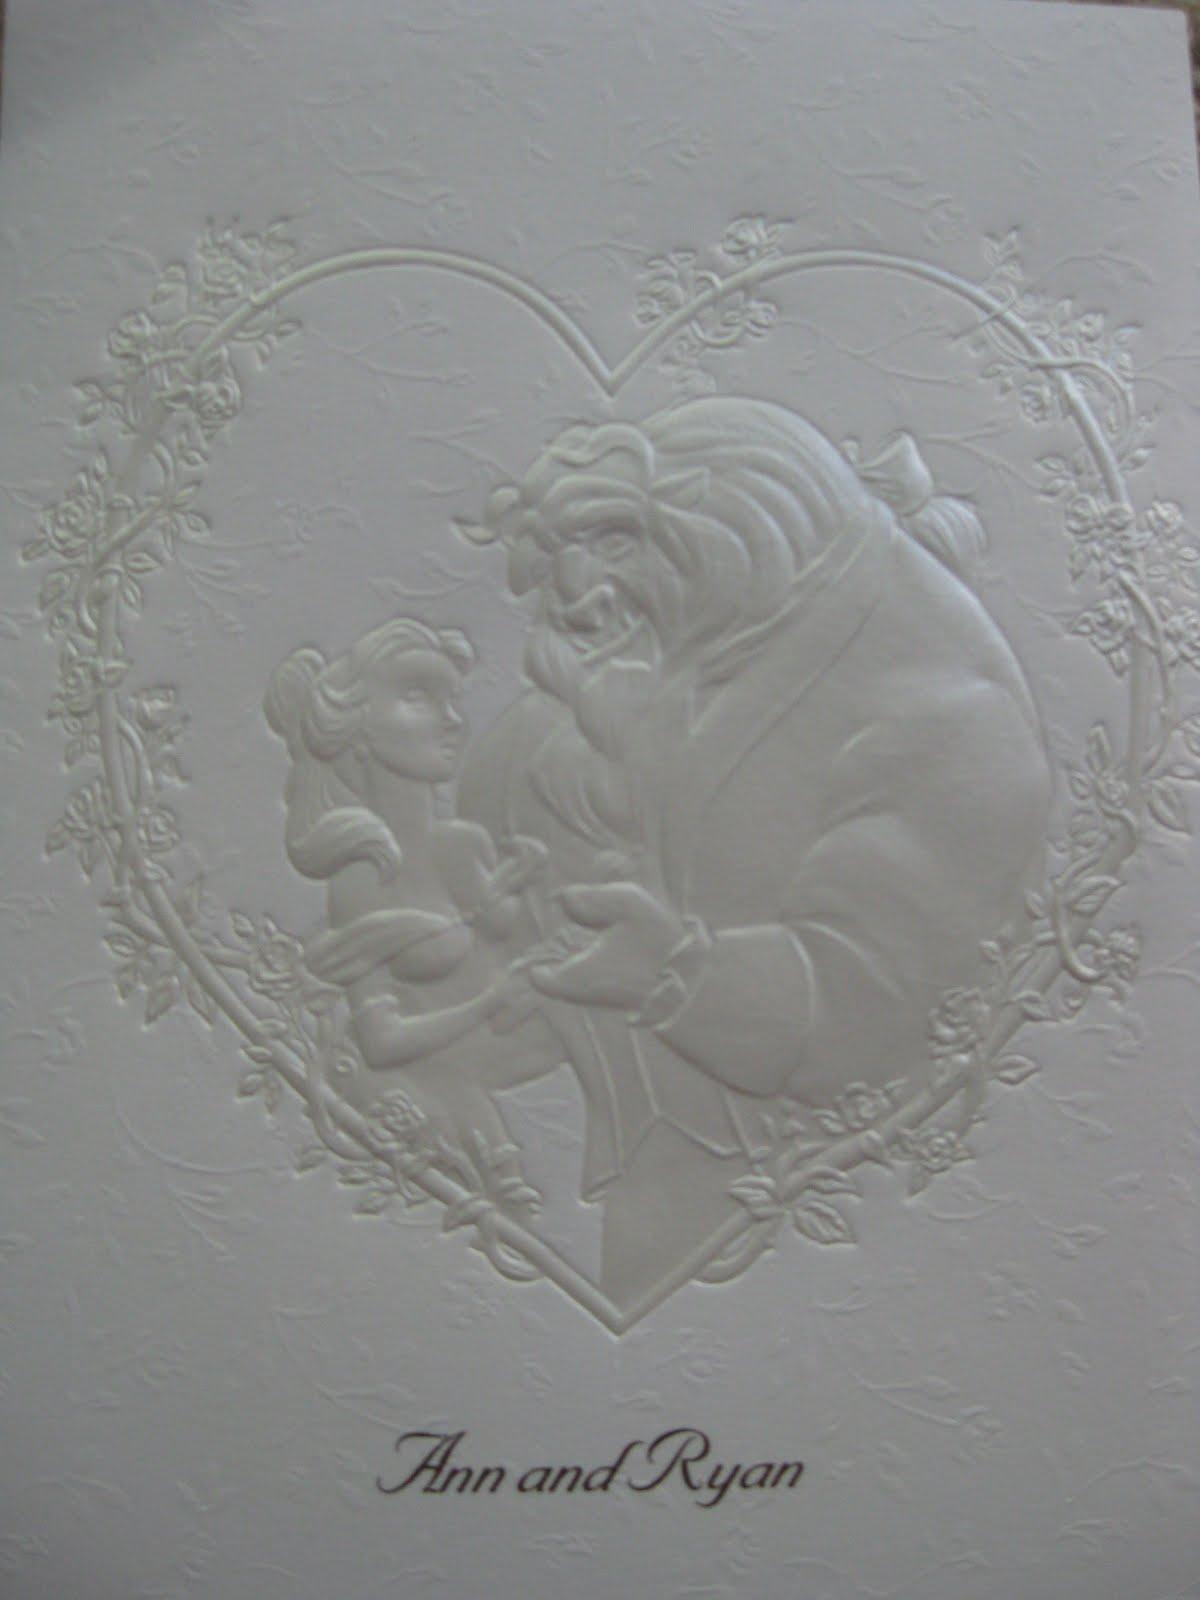 Beauty And The Beast Wedding Invitations is amazing invitation design